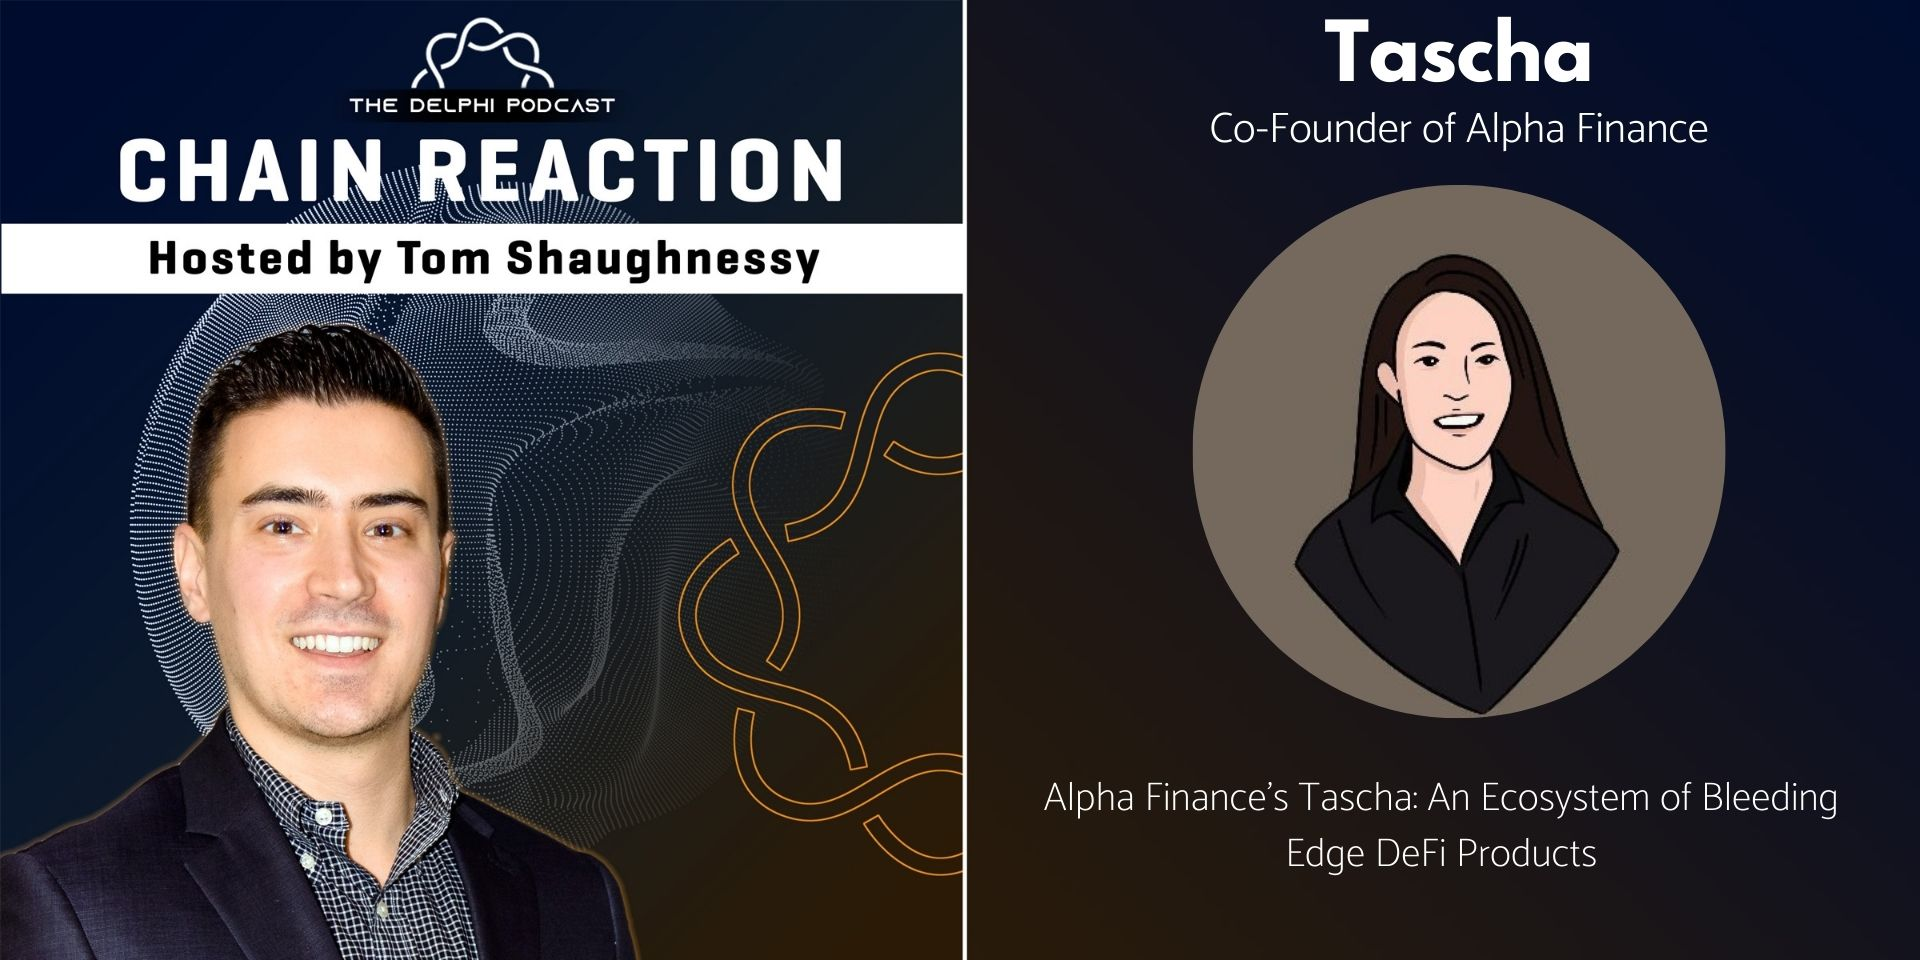 Alpha Finance's Tascha: An Ecosystem of Bleeding Edge DeFi Products ✨